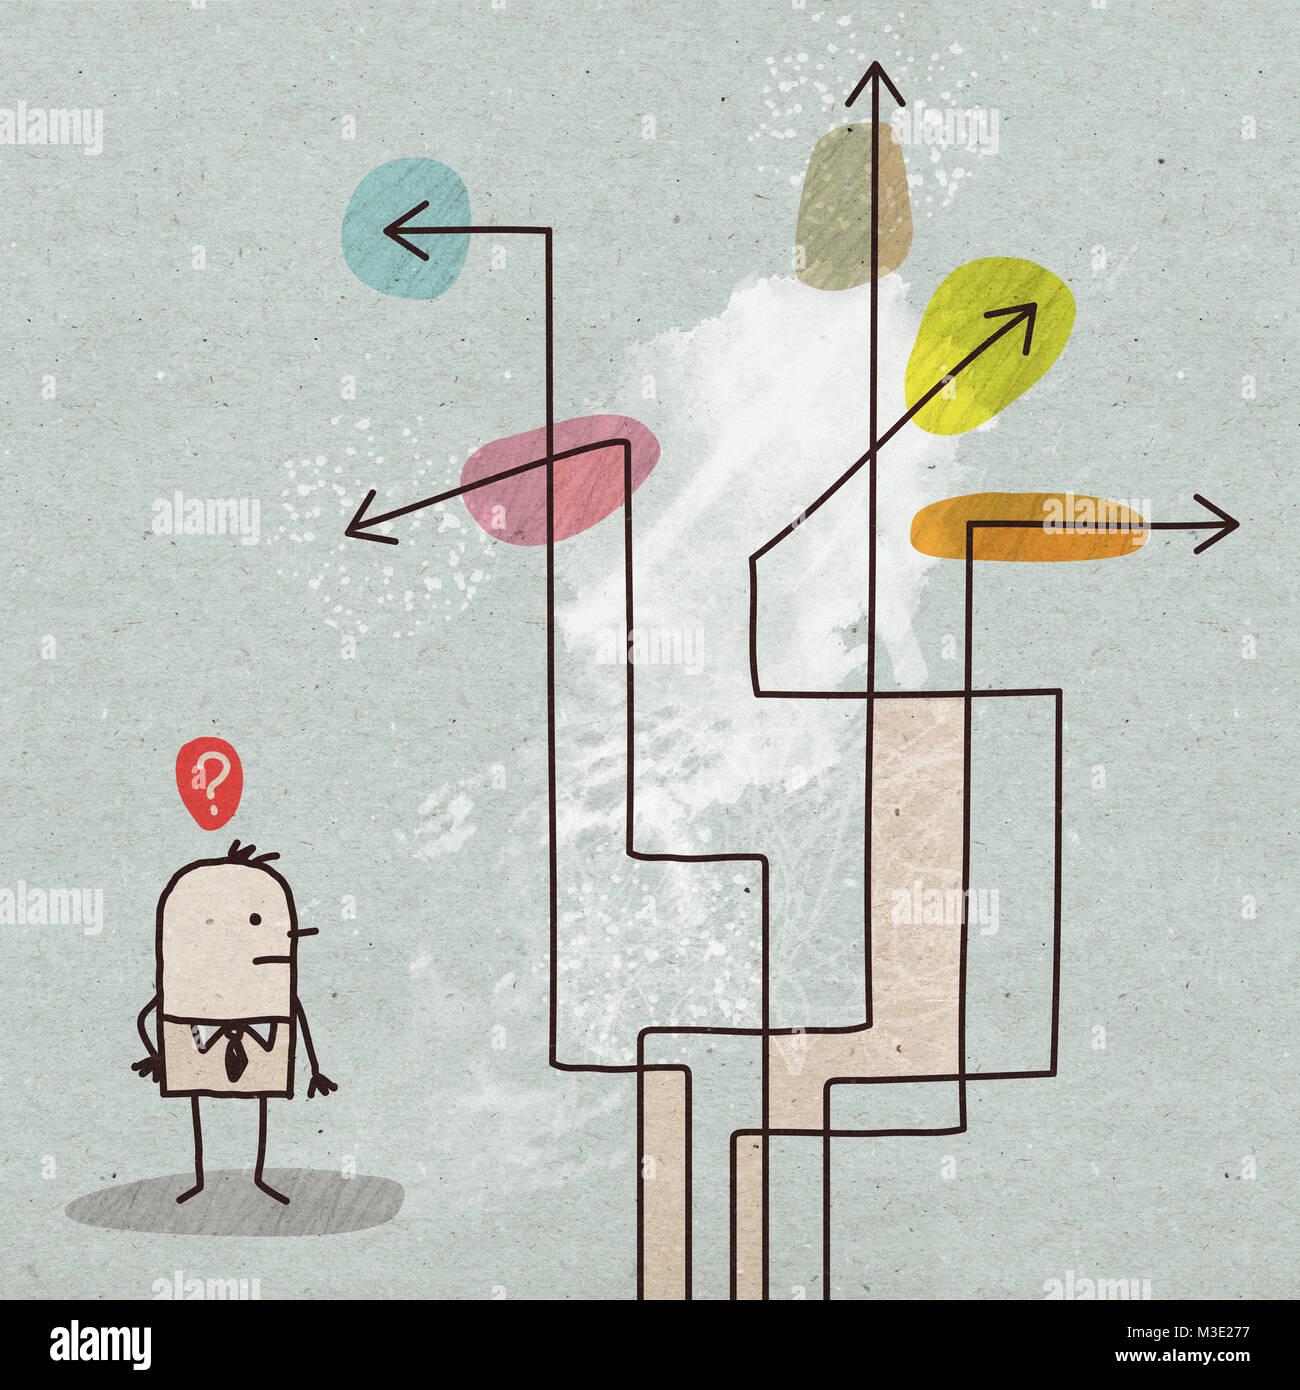 Cartoon Businessman Choosing a Direction - Stock Image